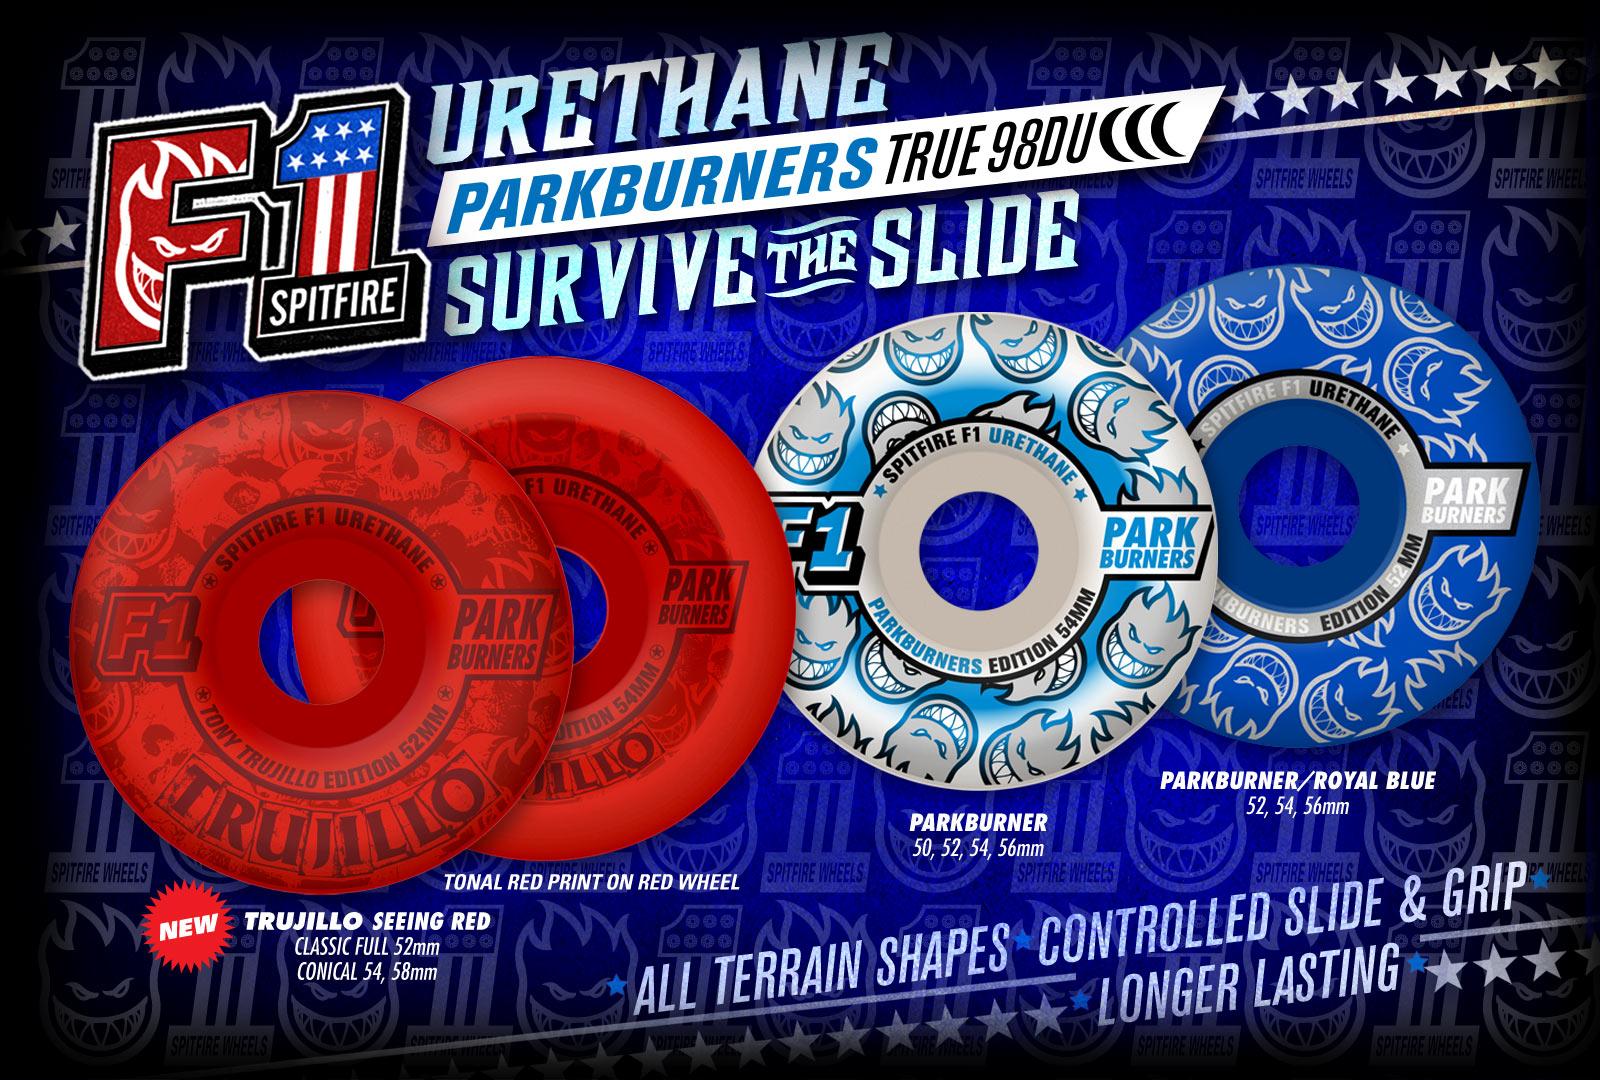 Spitfire Wheels Logo Wallpaper images 1600x1080